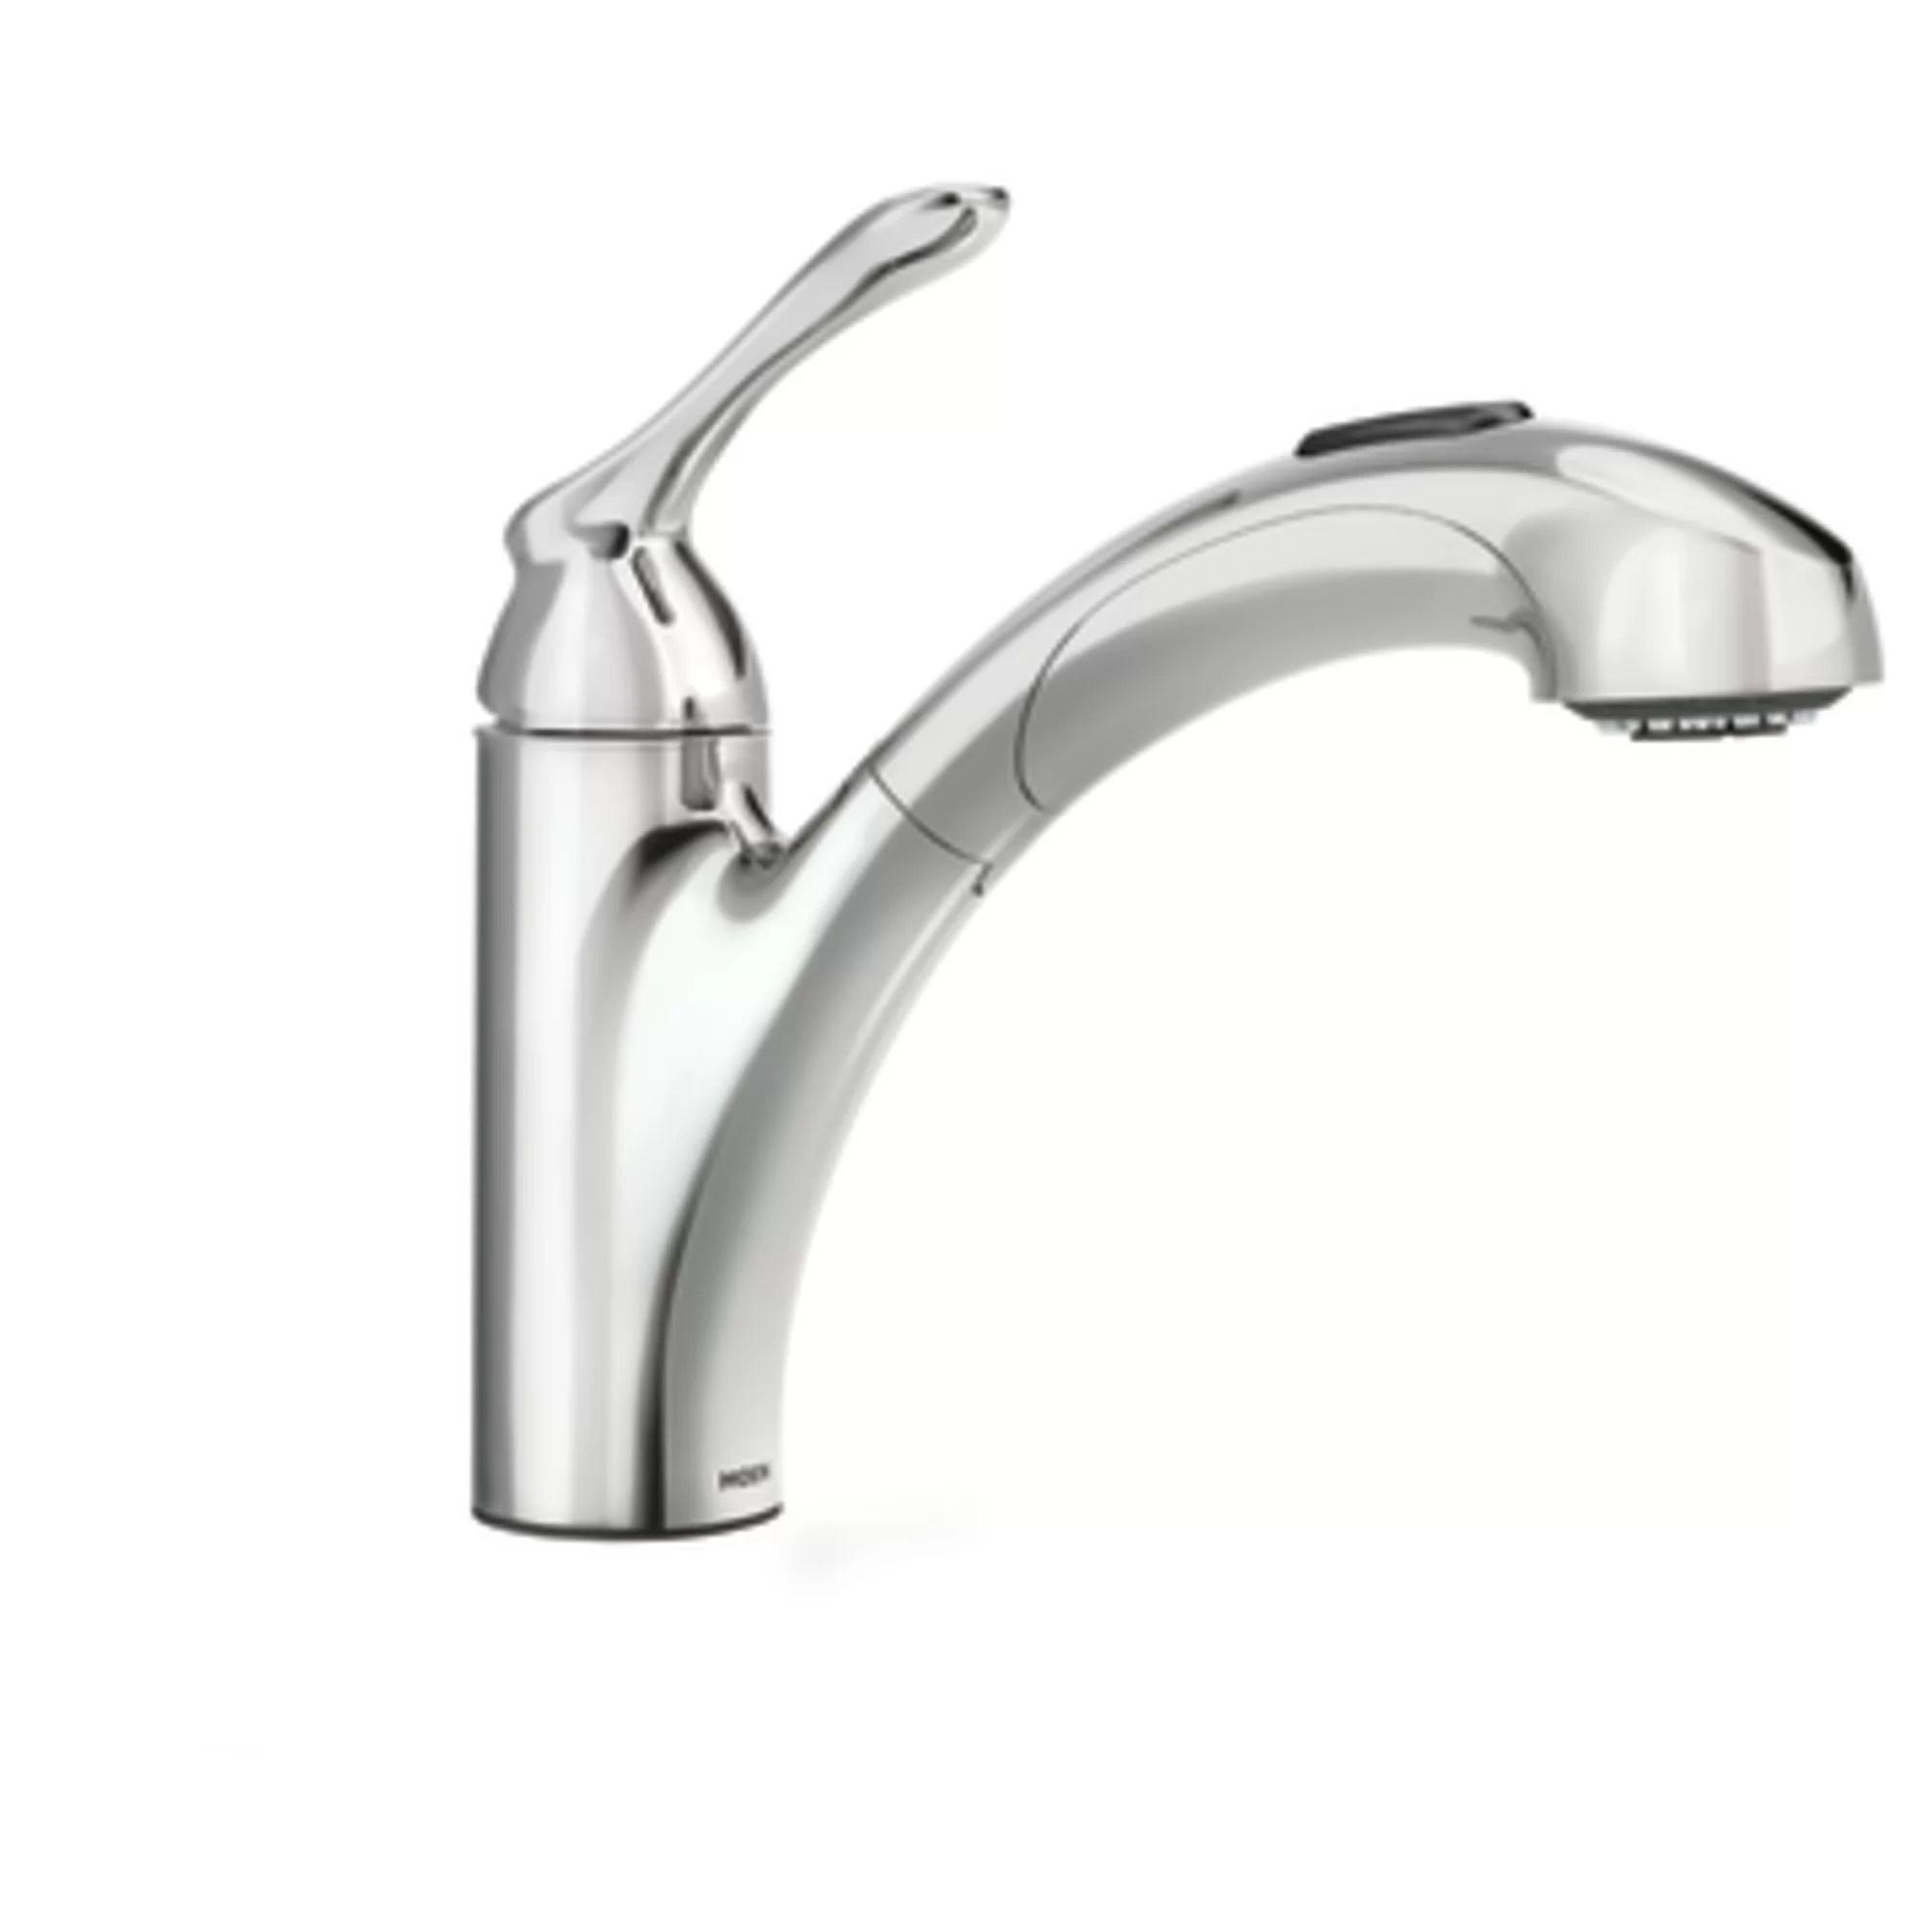 moen kitchen faucet reviews laminate cabinets banbury single handle deck mounted